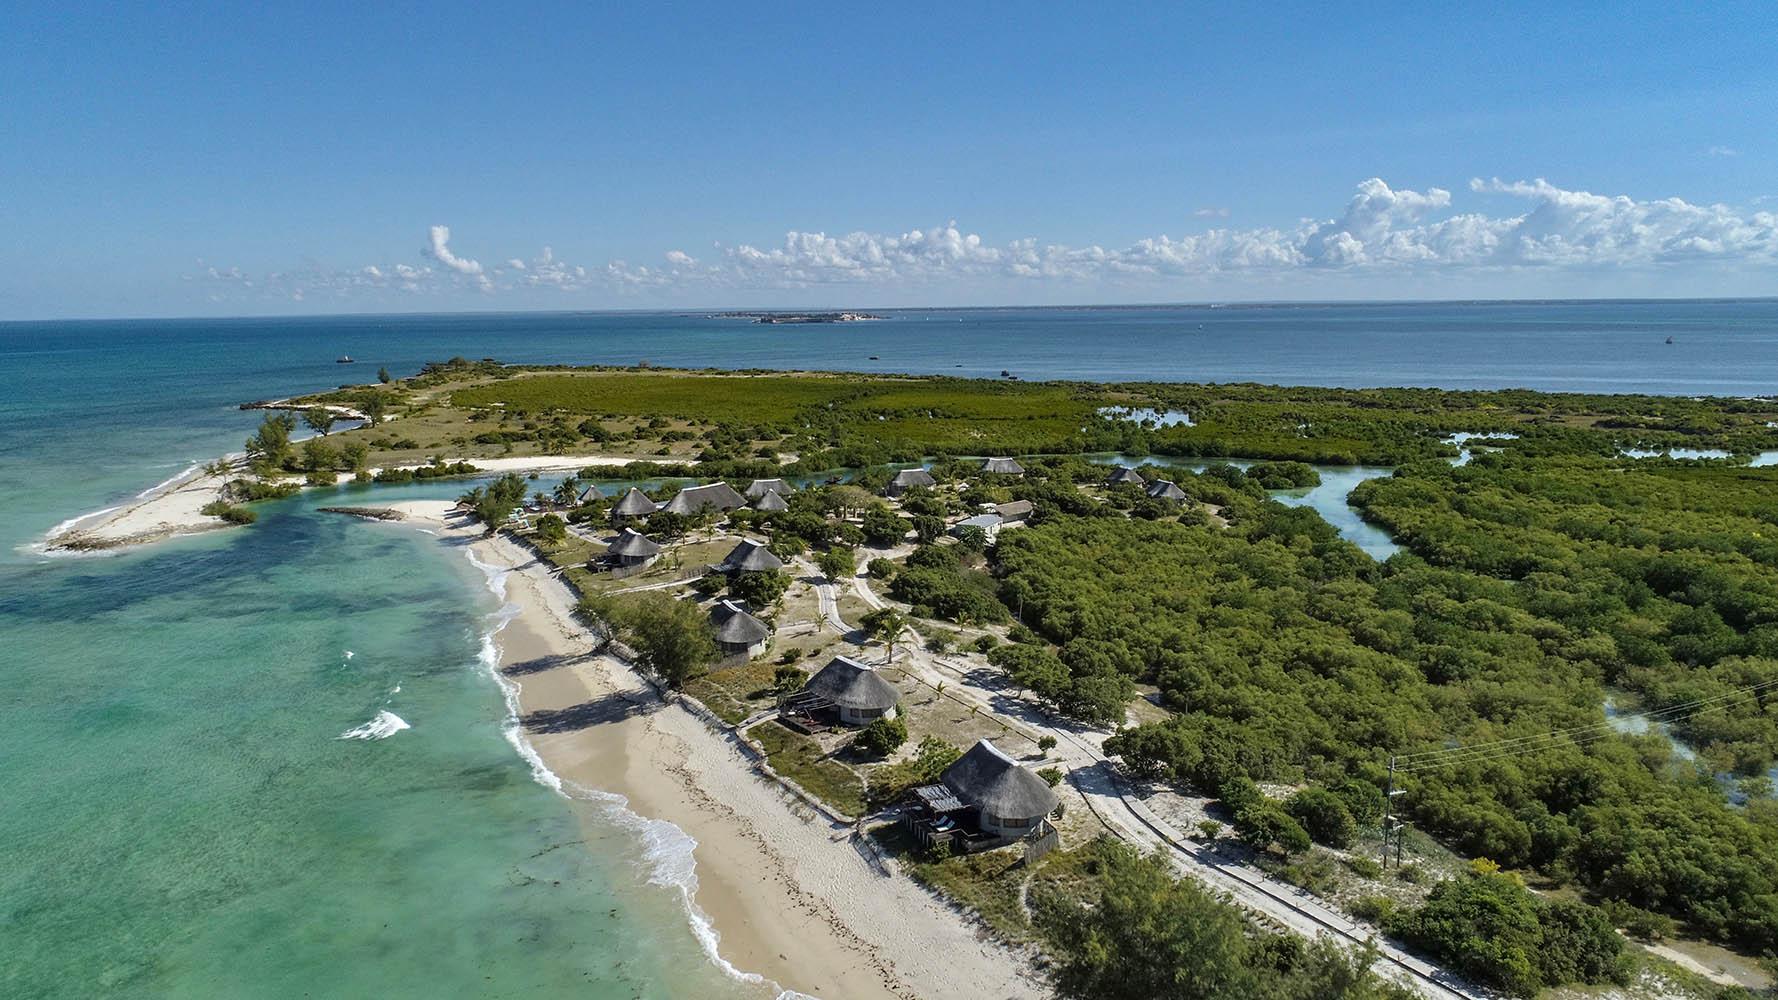 coral lodge nampula-province-mozambique-lodges-zambia-in-style-breath-taking-landscape-beach-and-beach-villas